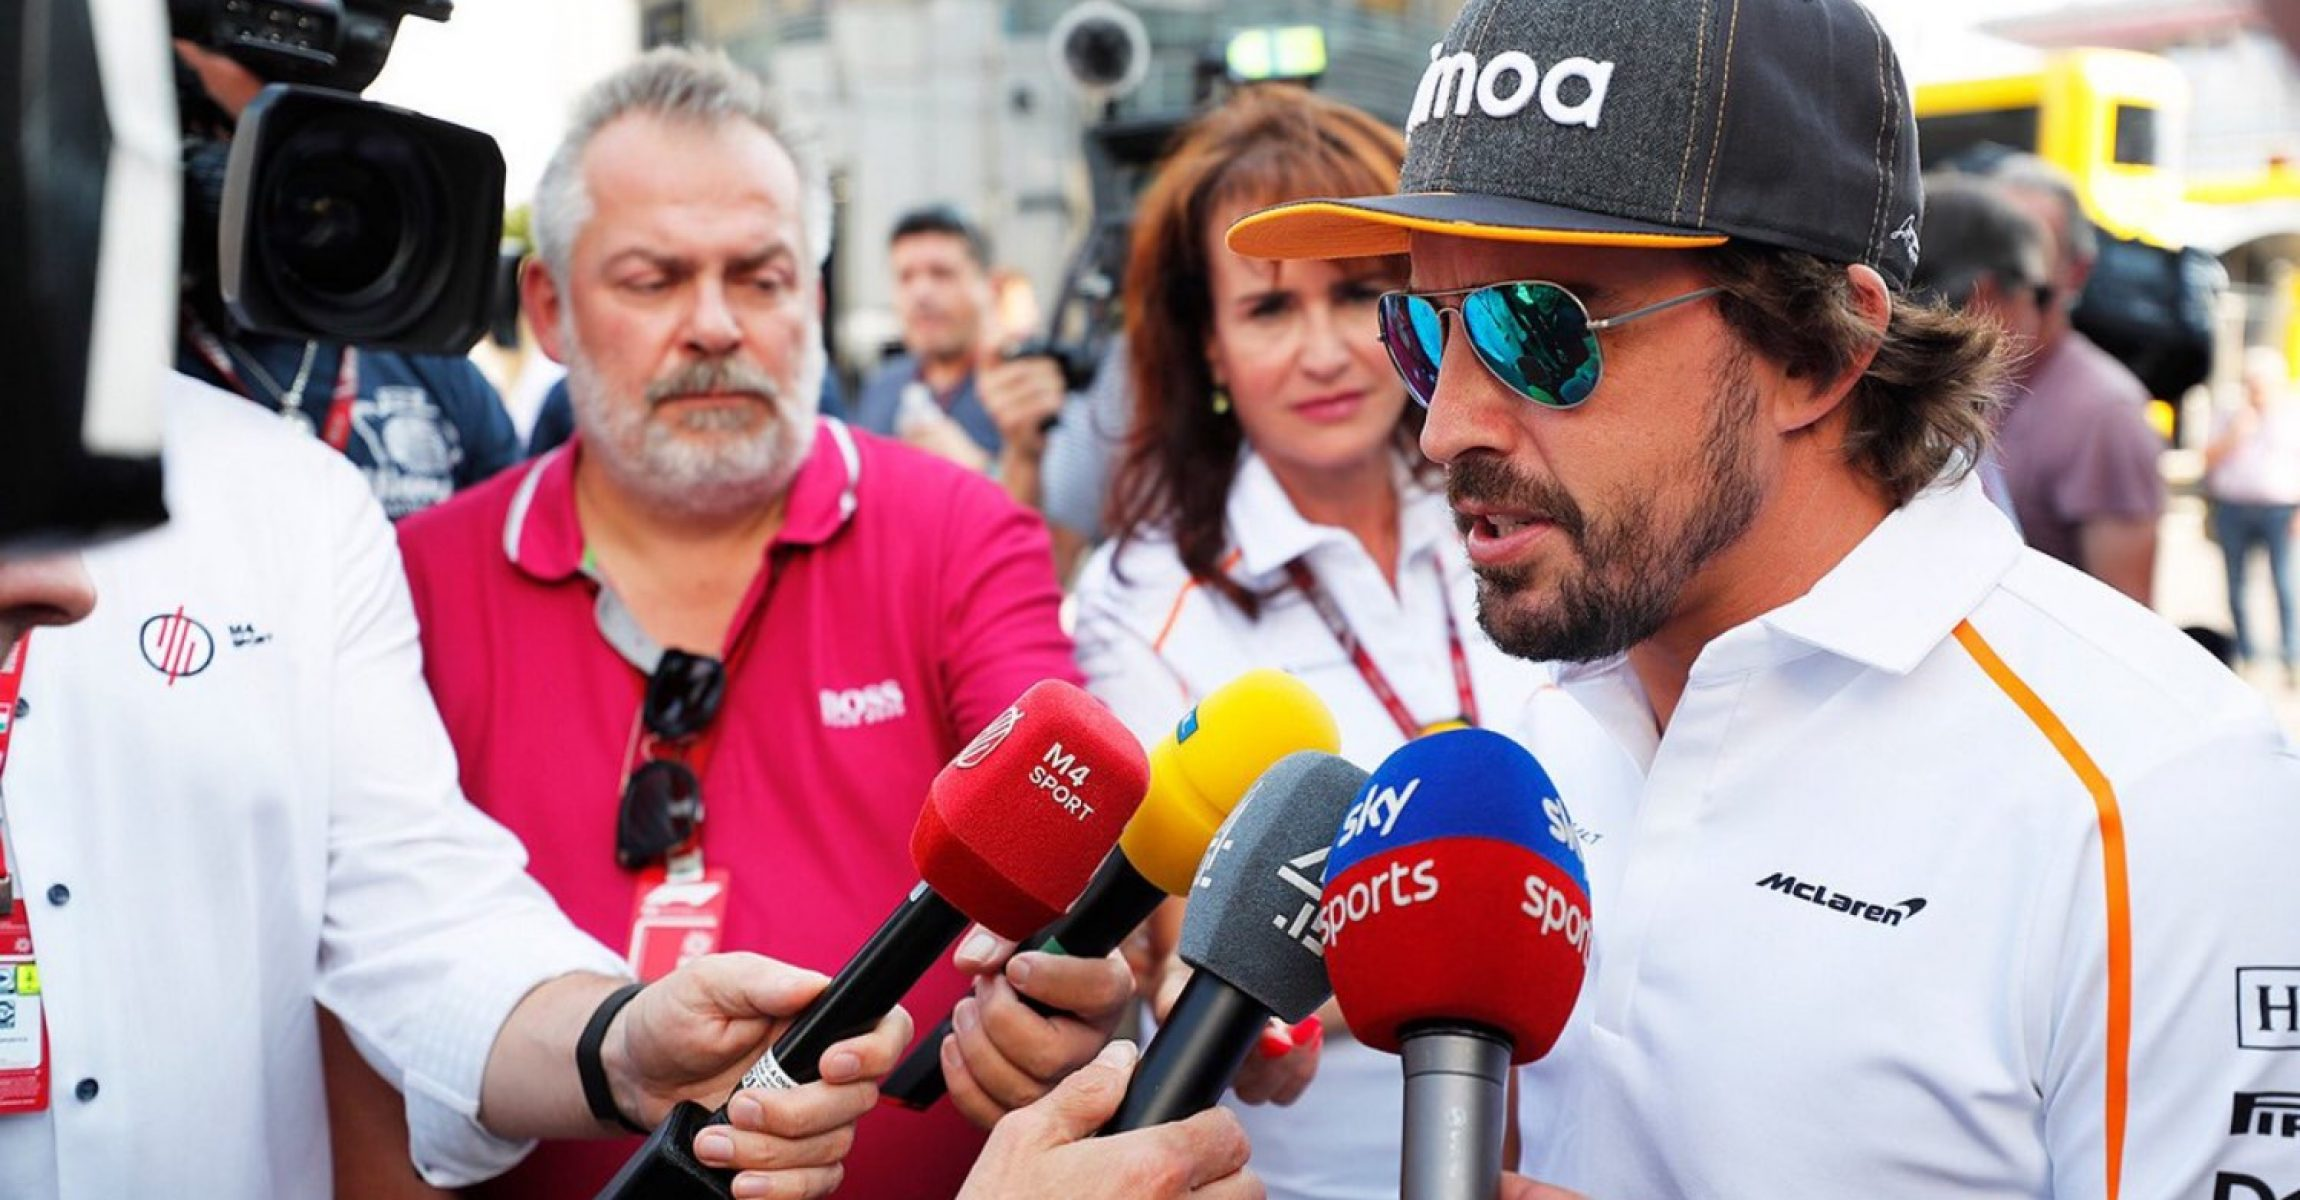 Fernando Alonso, McLaren, Monza, Sky Sports F1, M4 Sport